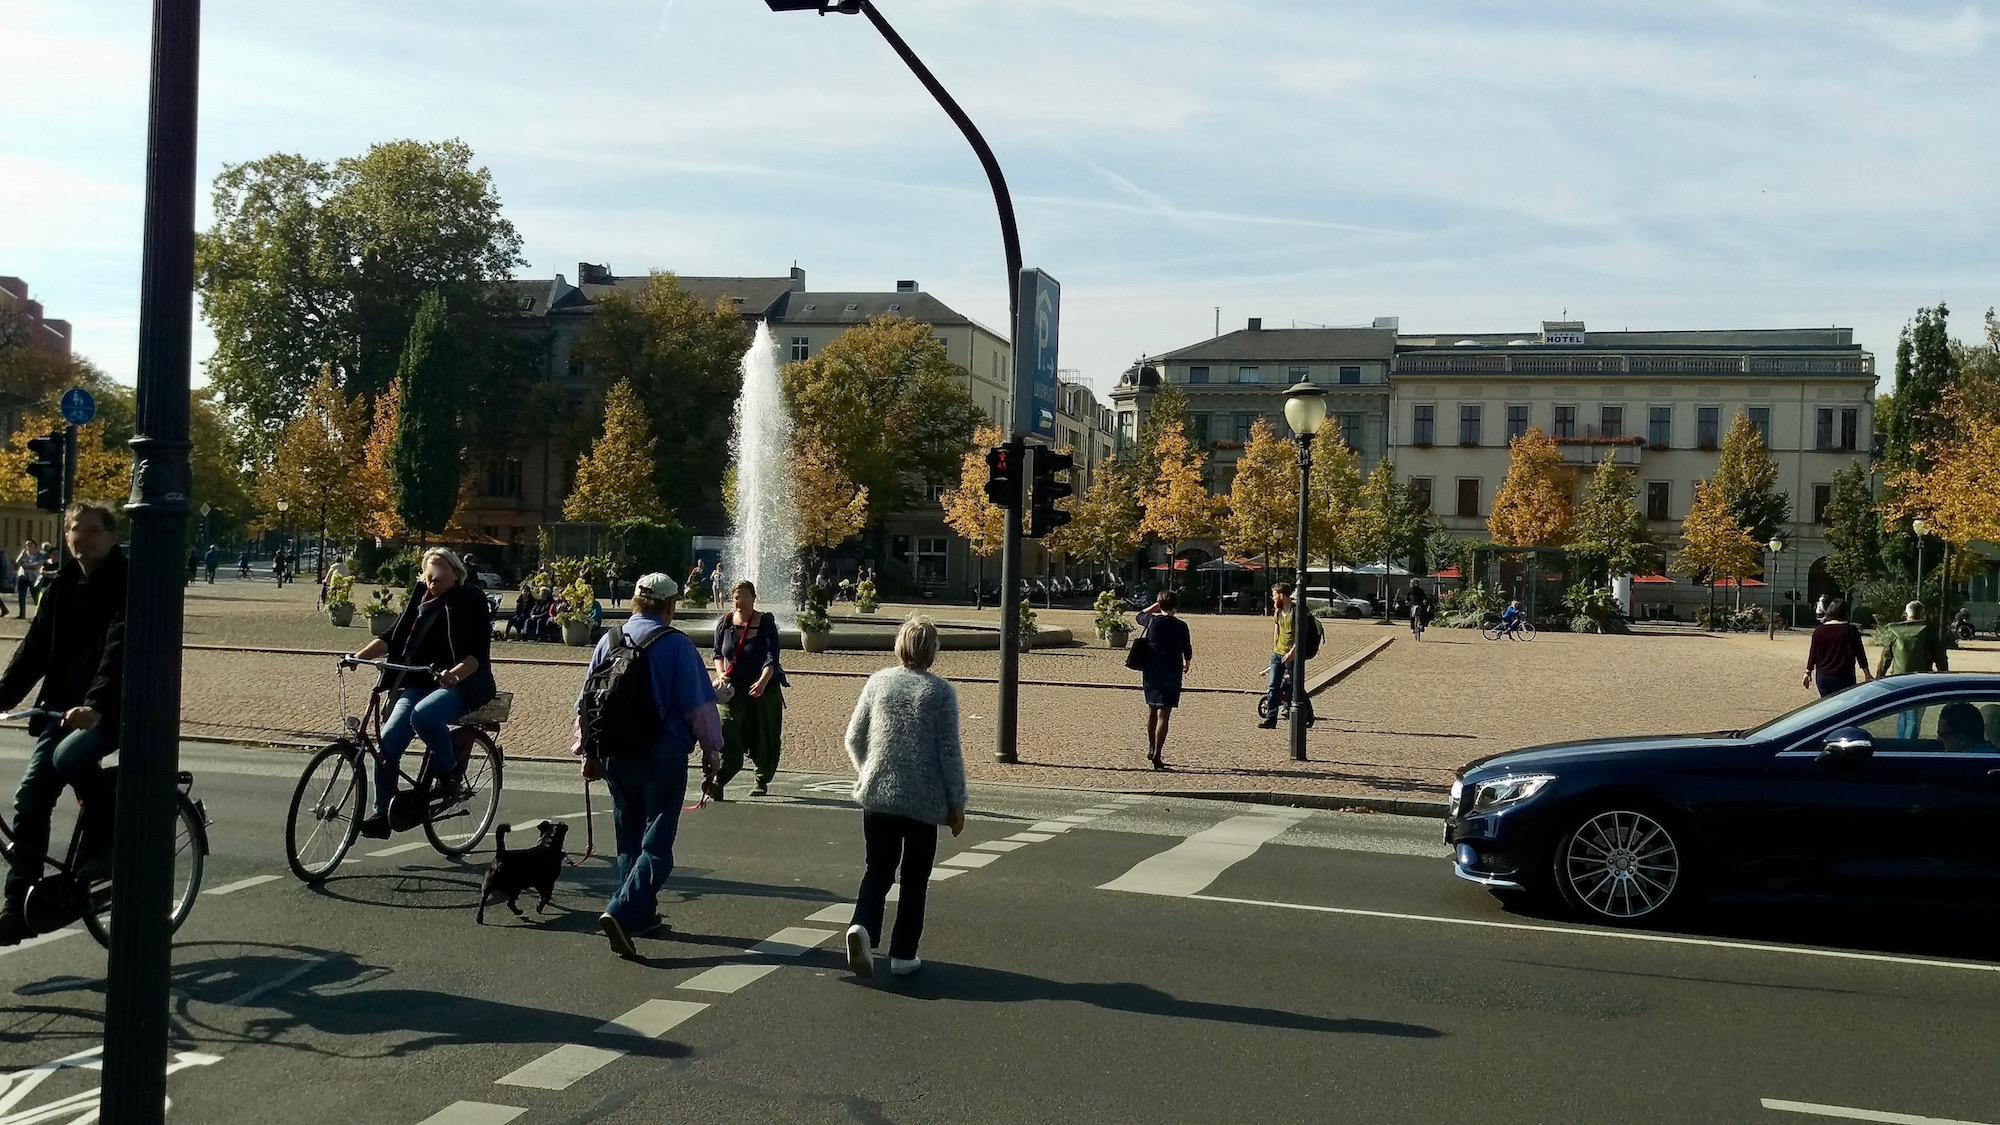 Luisenplatz looks great in a beautiful autumn day.